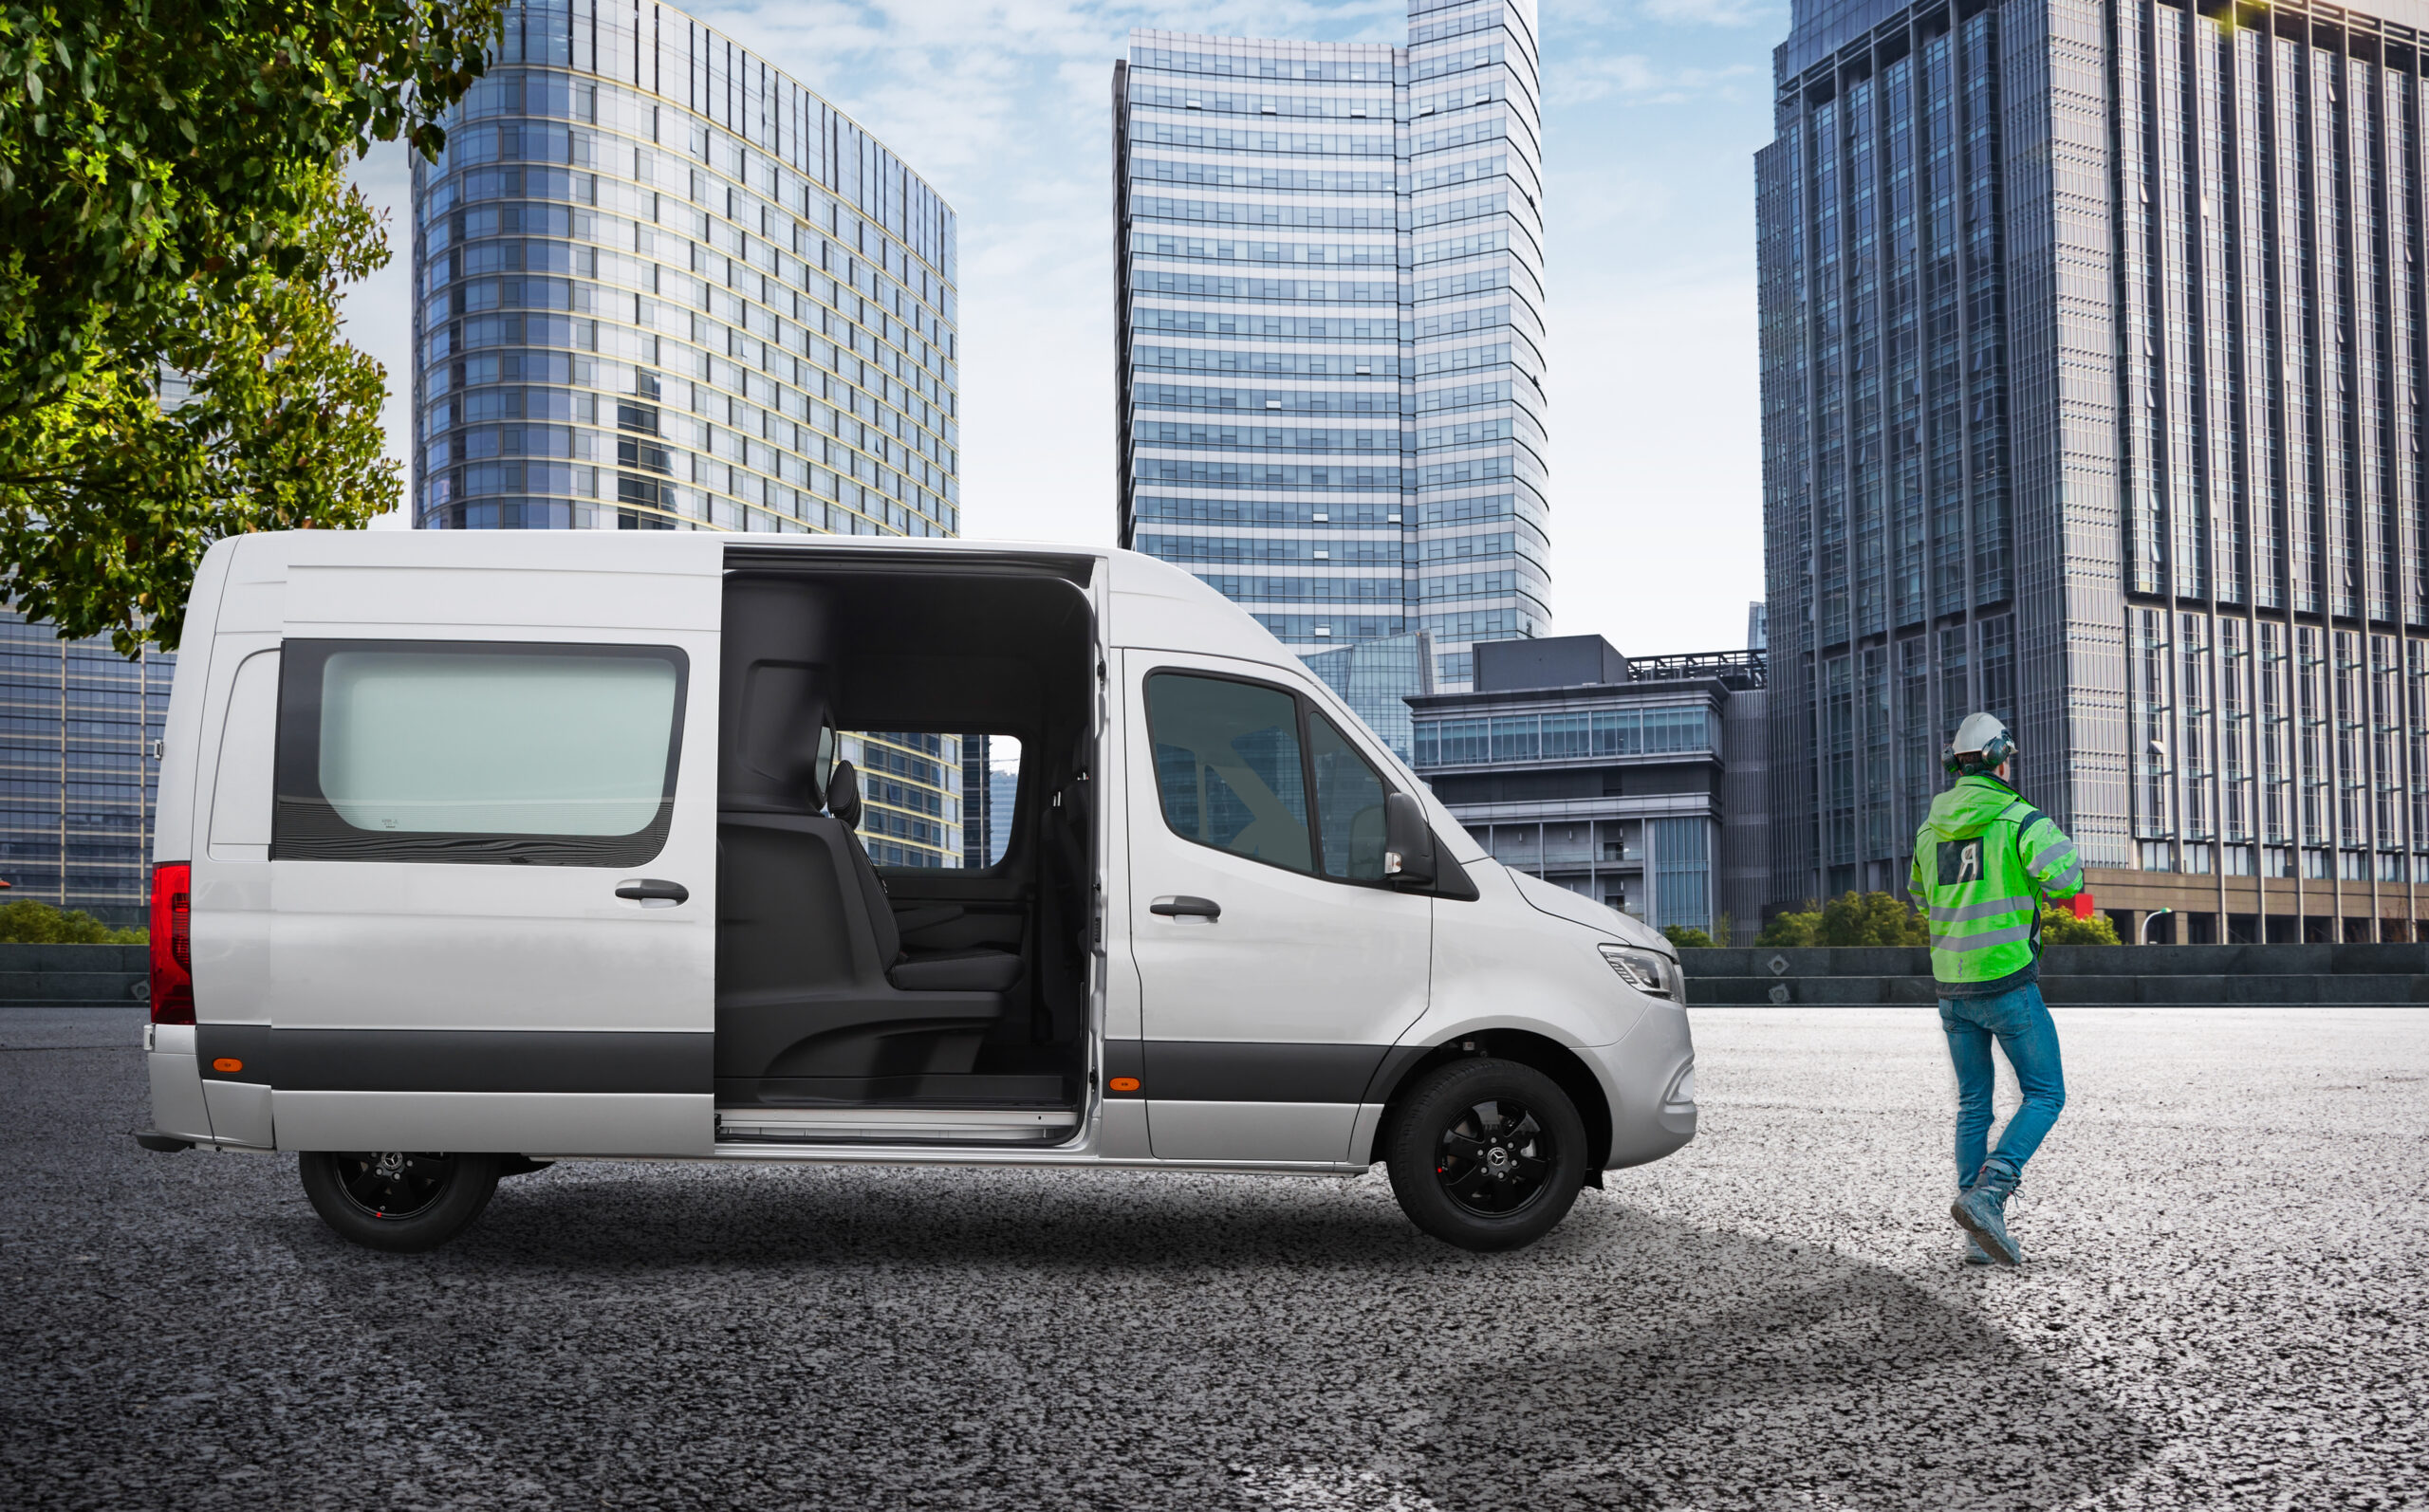 Mercedes-Benz Crew Van kit by Snoeks Automotive